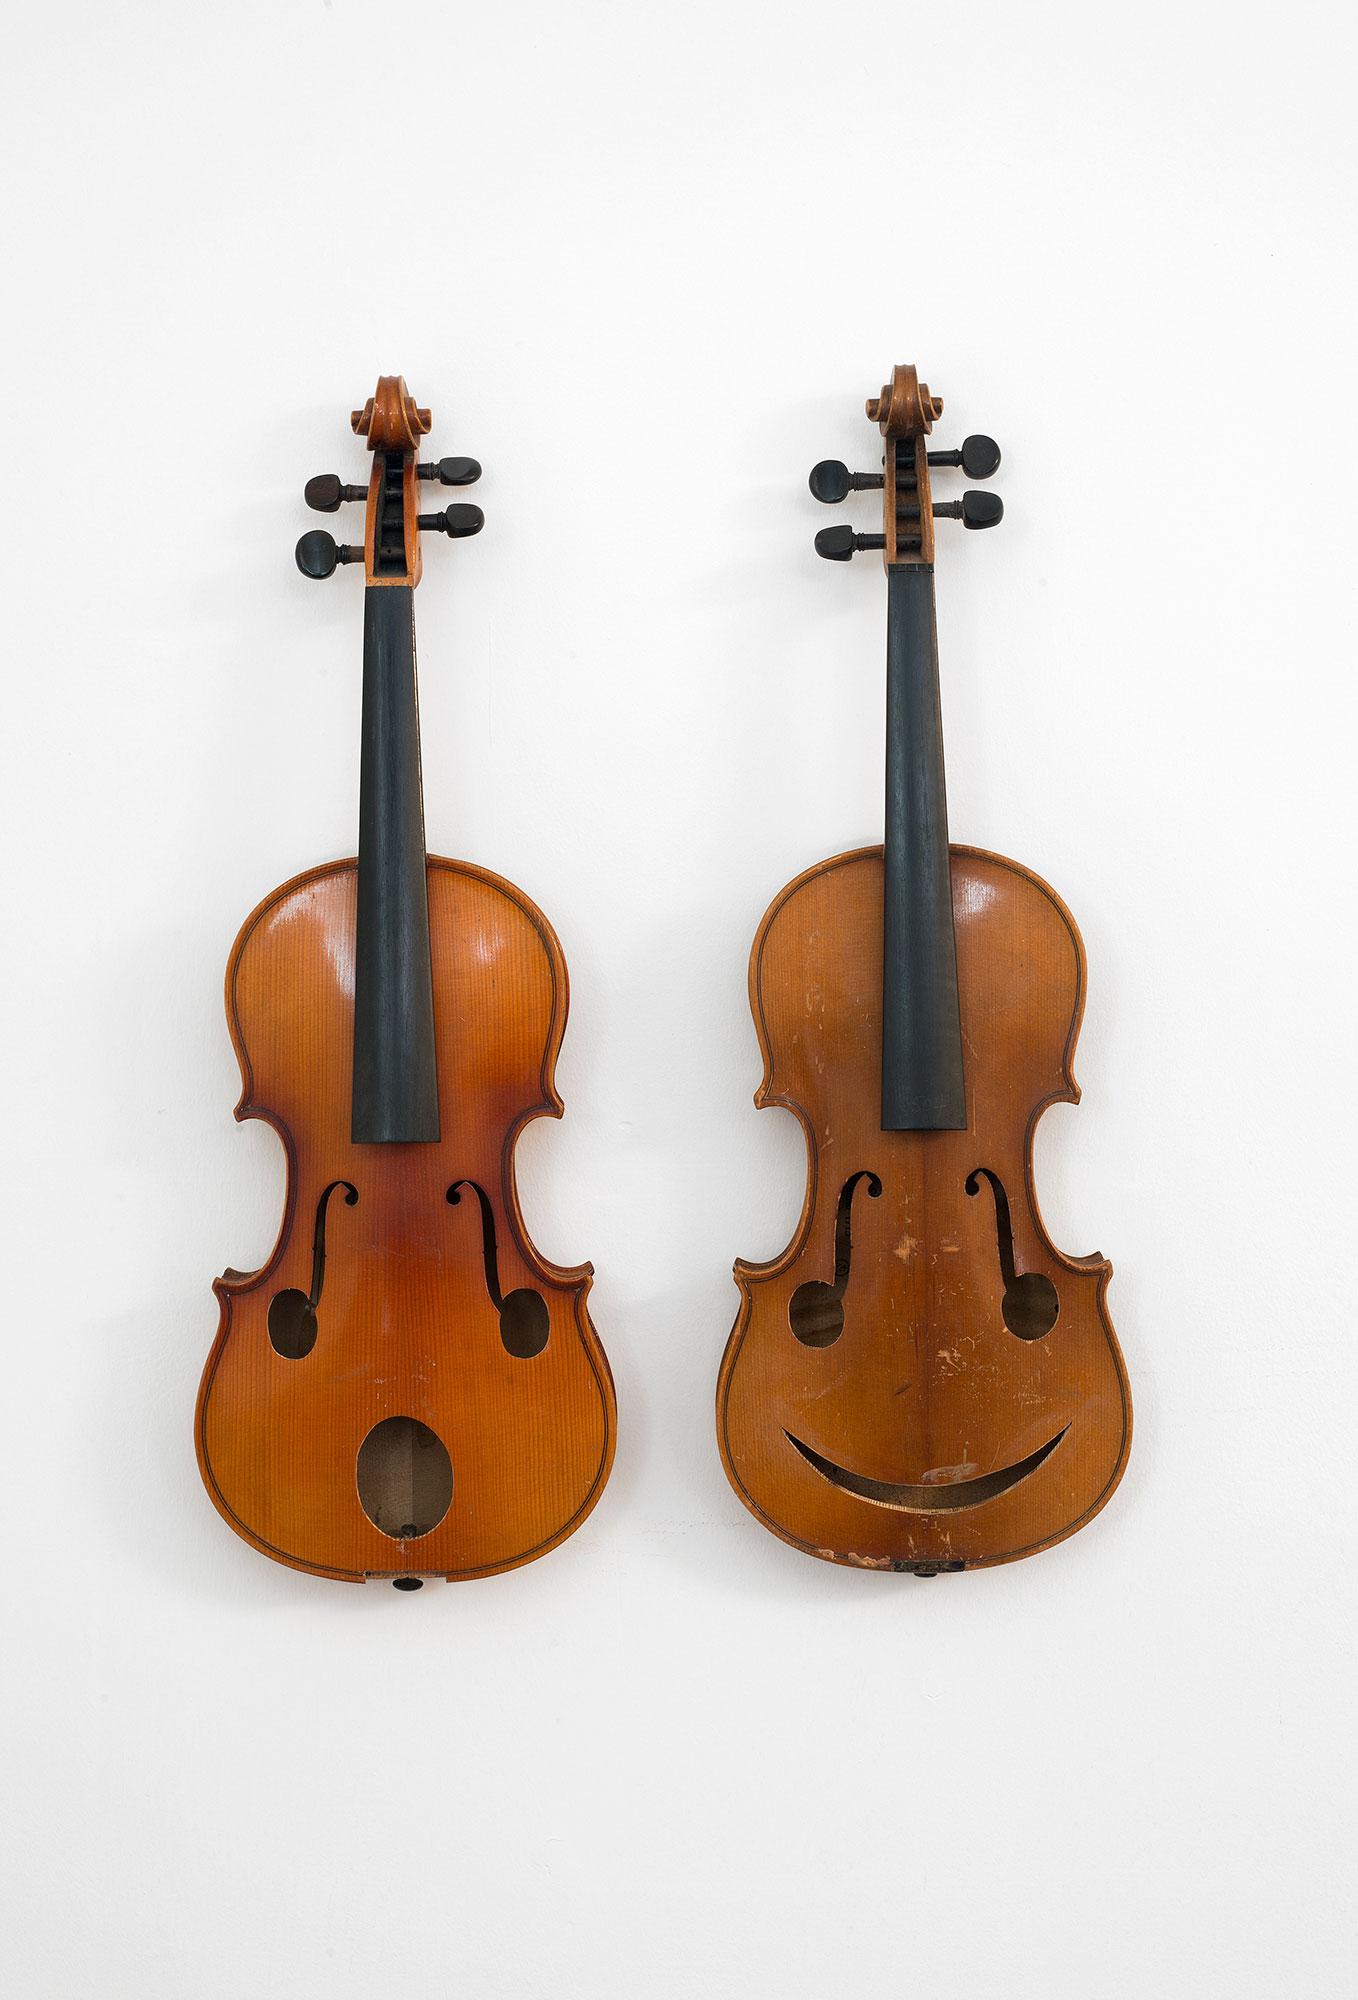 2 violins